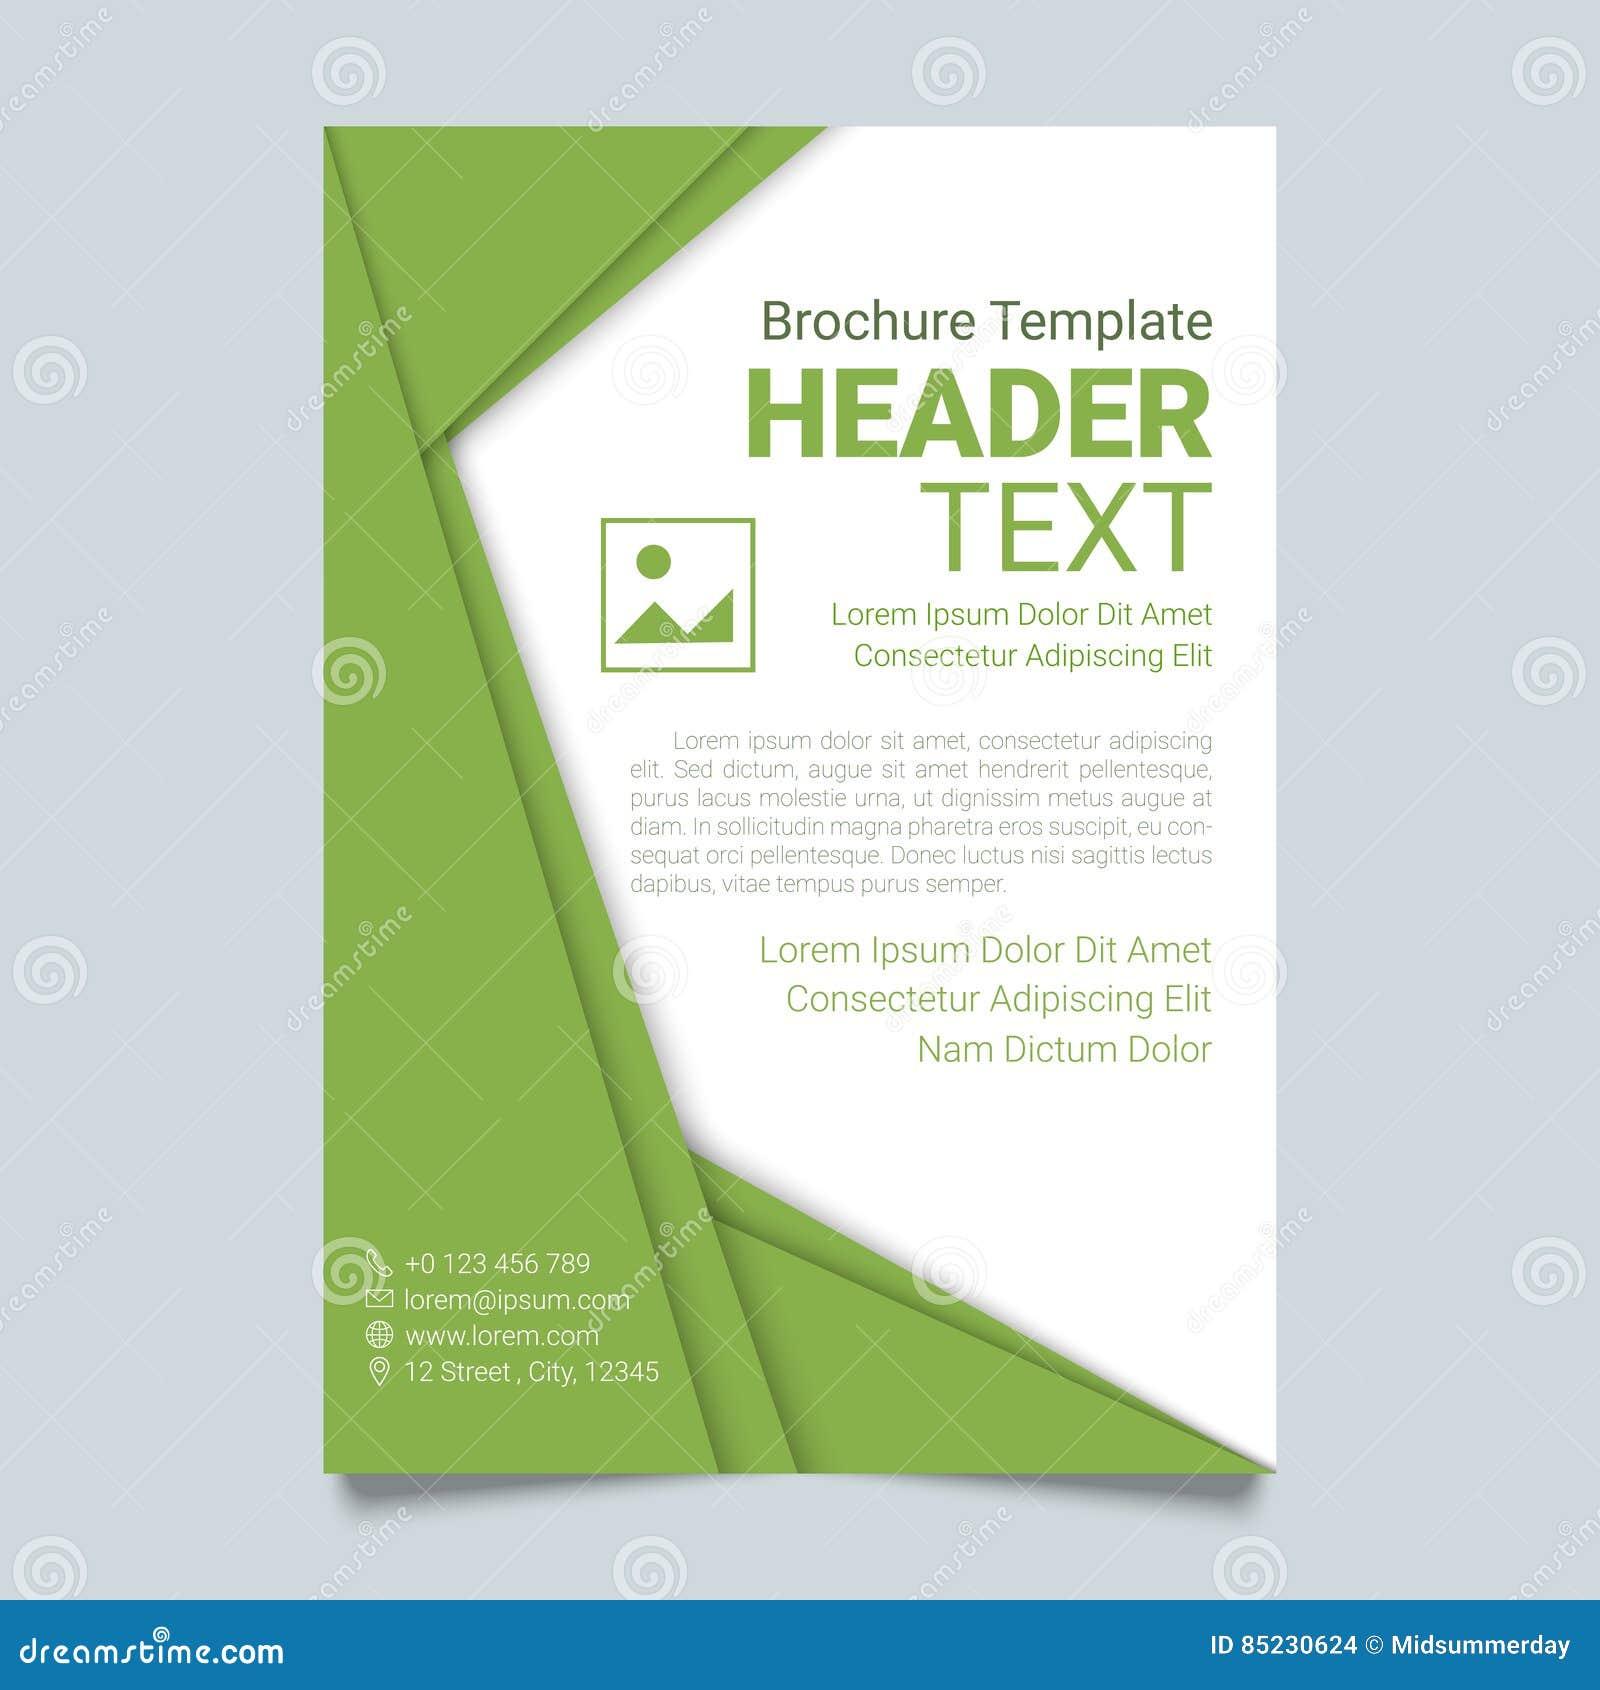 Creative Brochure Vector Template In Green Color. Modern ...